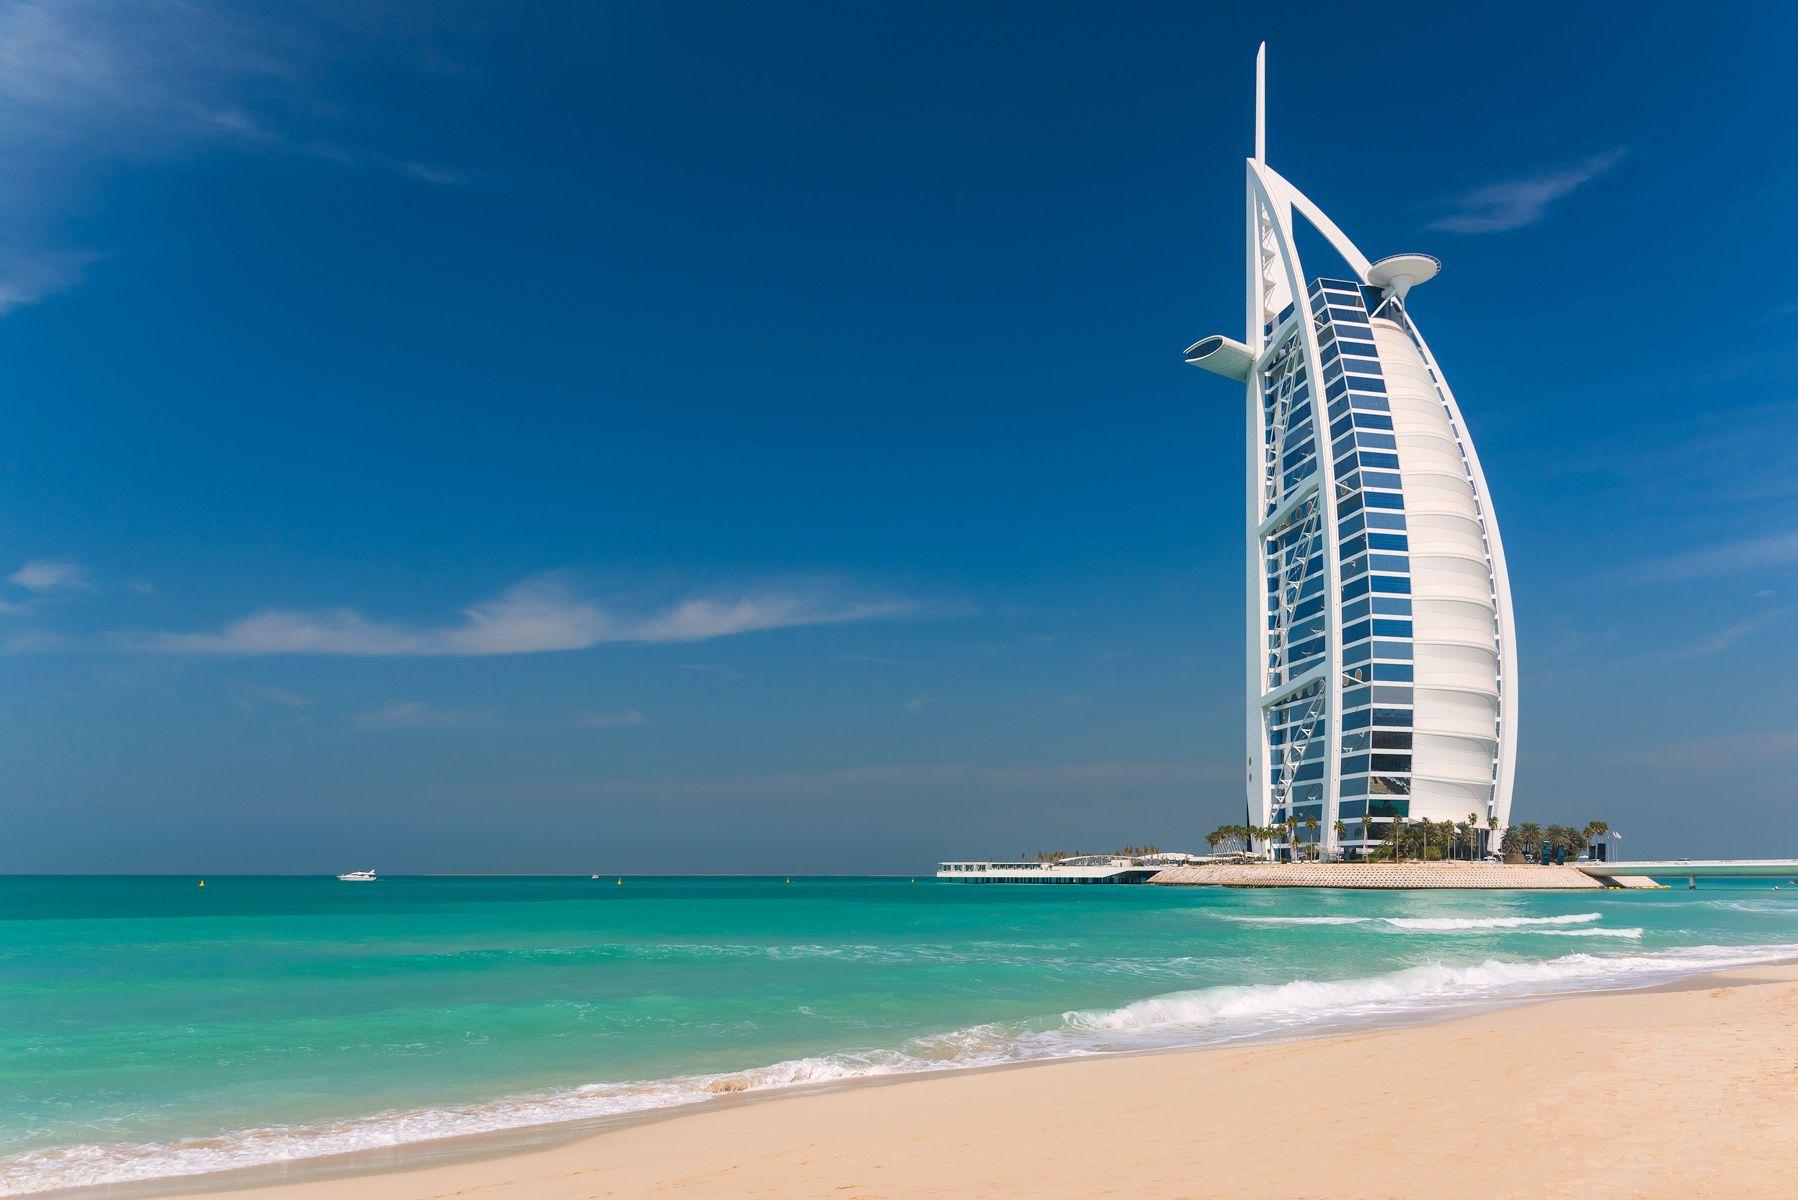 Burj Al Arab Hotel, Dubai, UAE